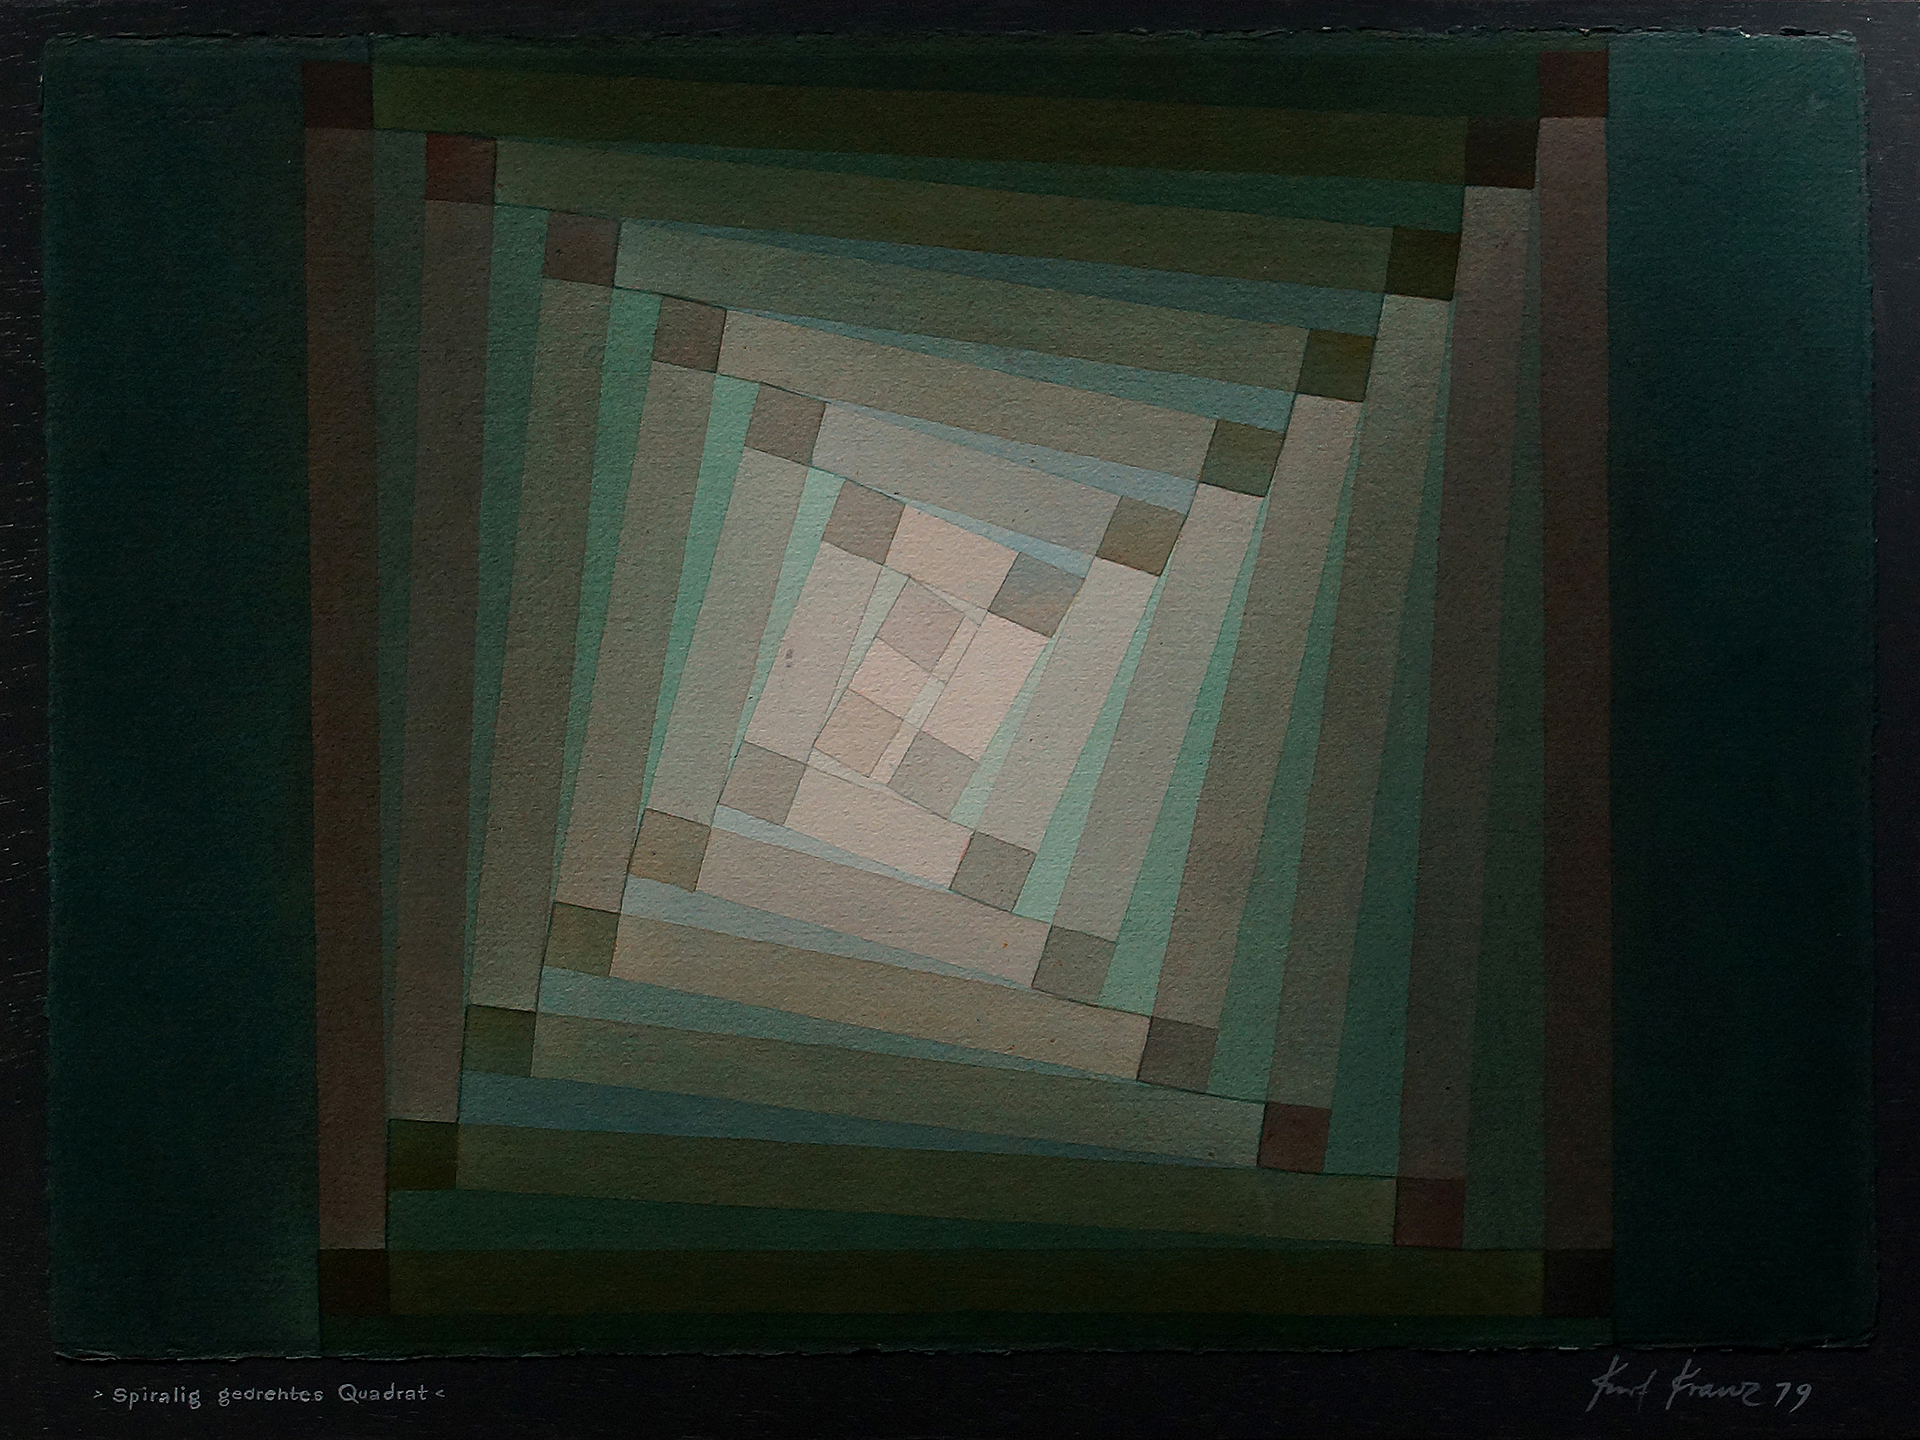 Kurt Kranz: Spiralig gedrehtes Quadrat (1979)